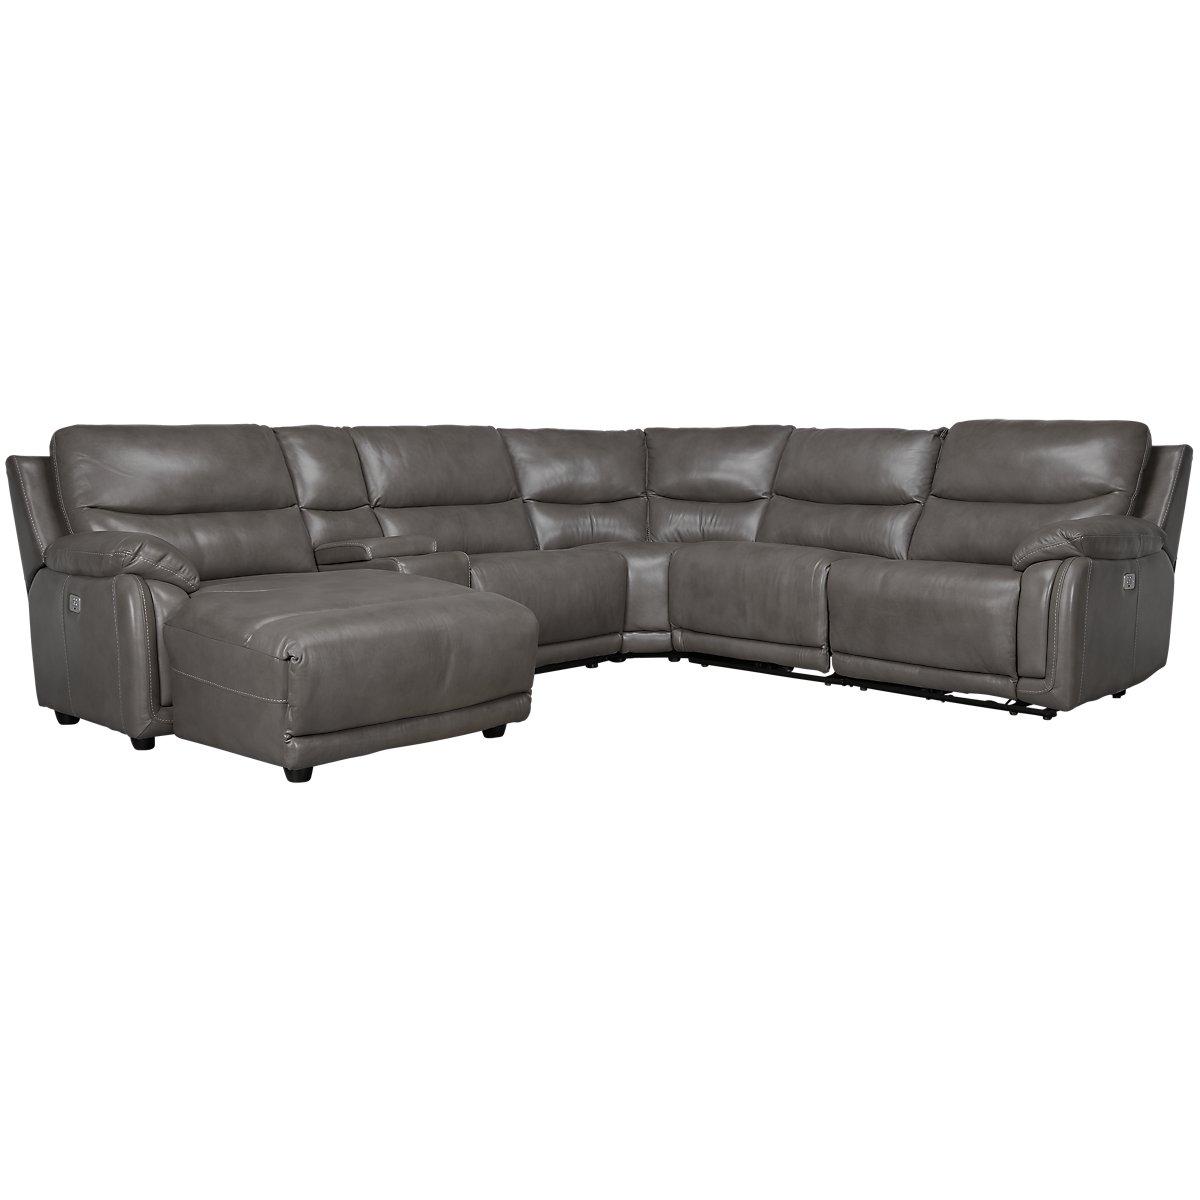 products neoprene black by modern sofa sectional lissoni plastics vinyl kartell piero resale